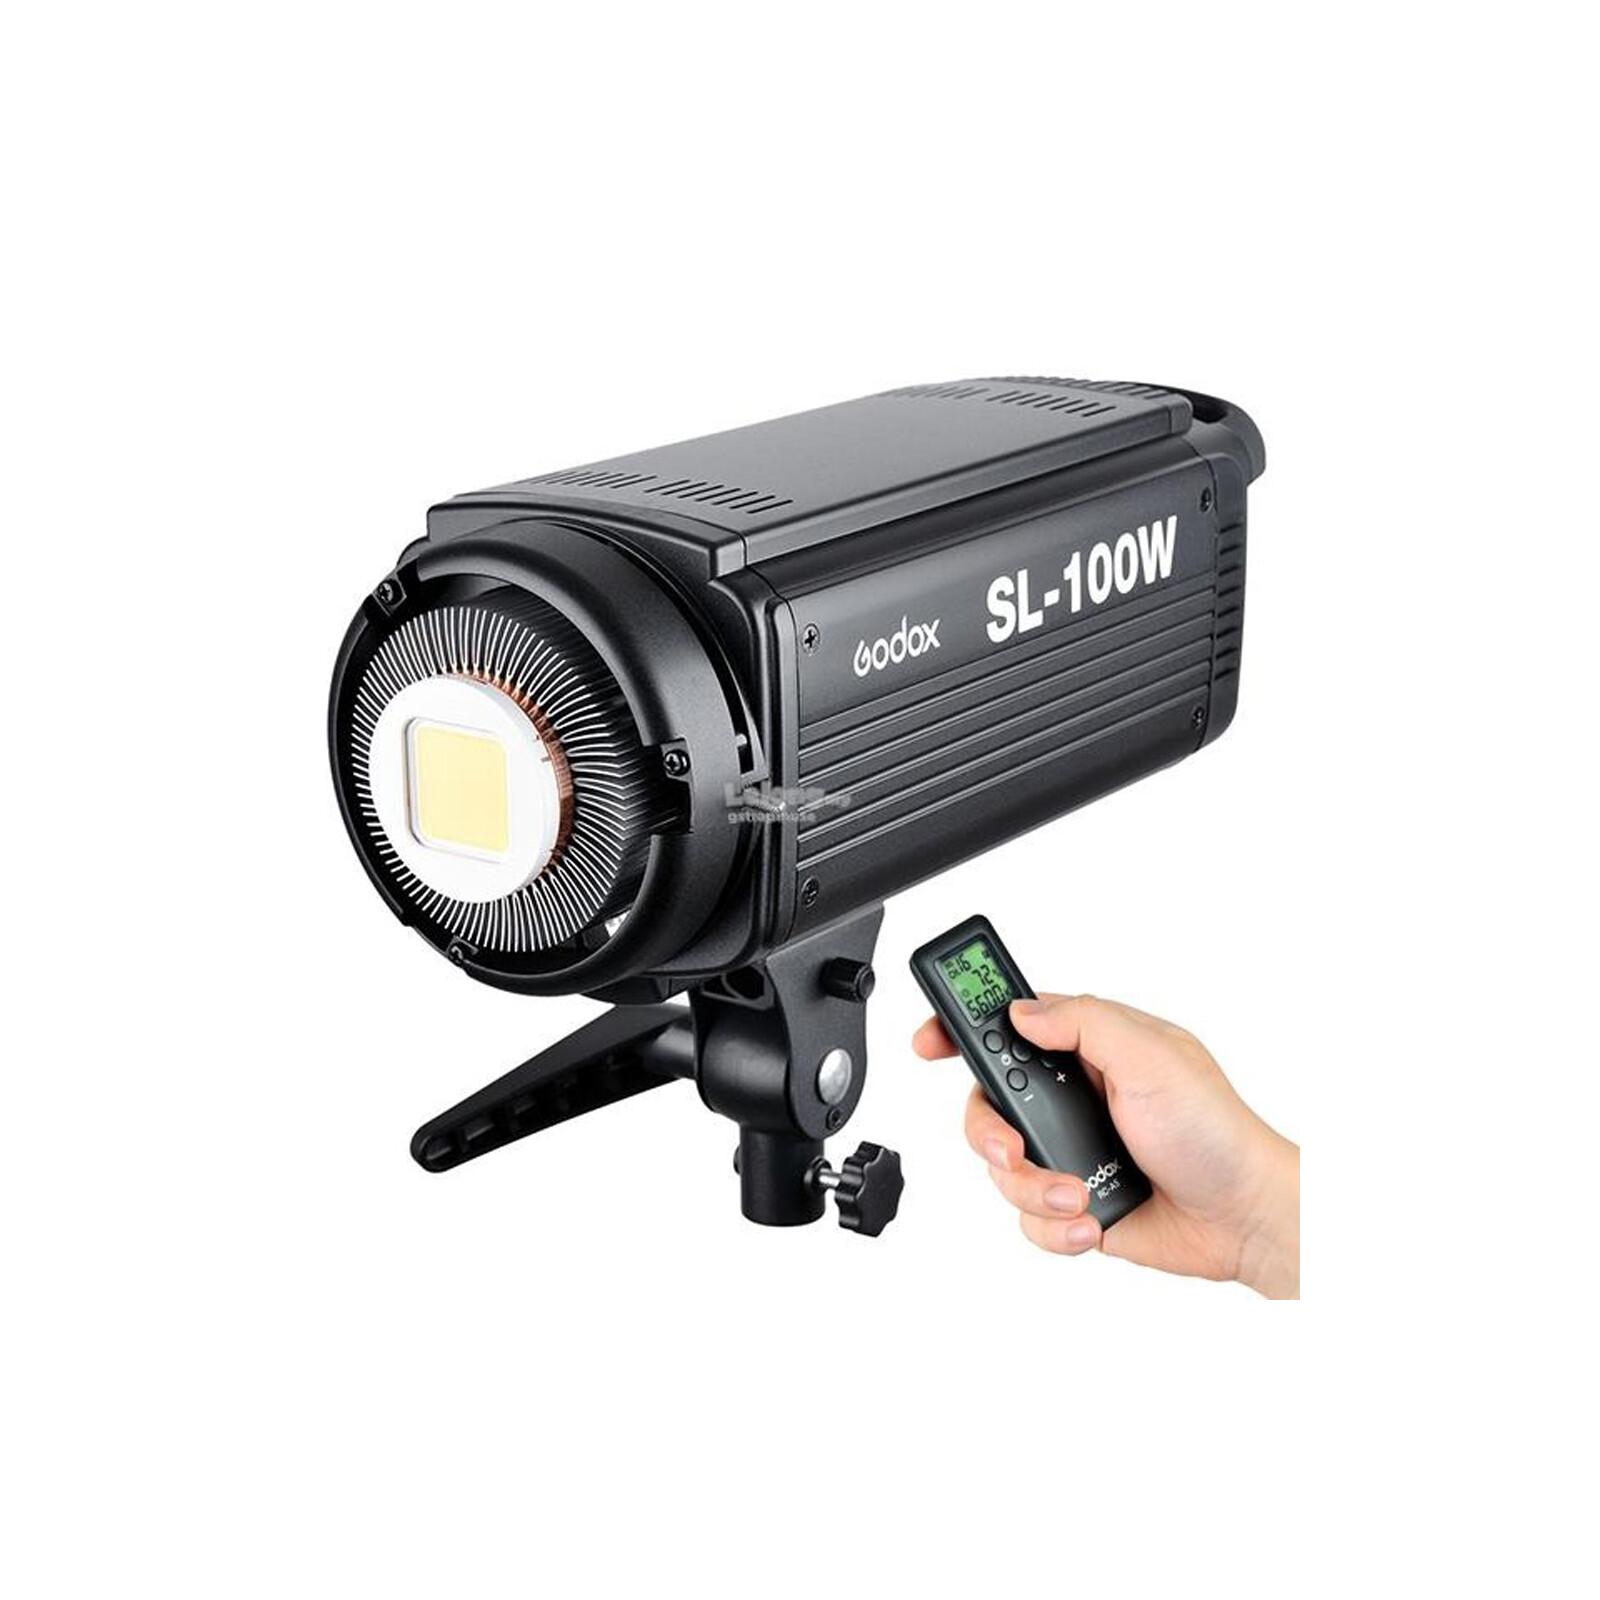 GODOX SL100W LED Video Light 100W with Remote Control